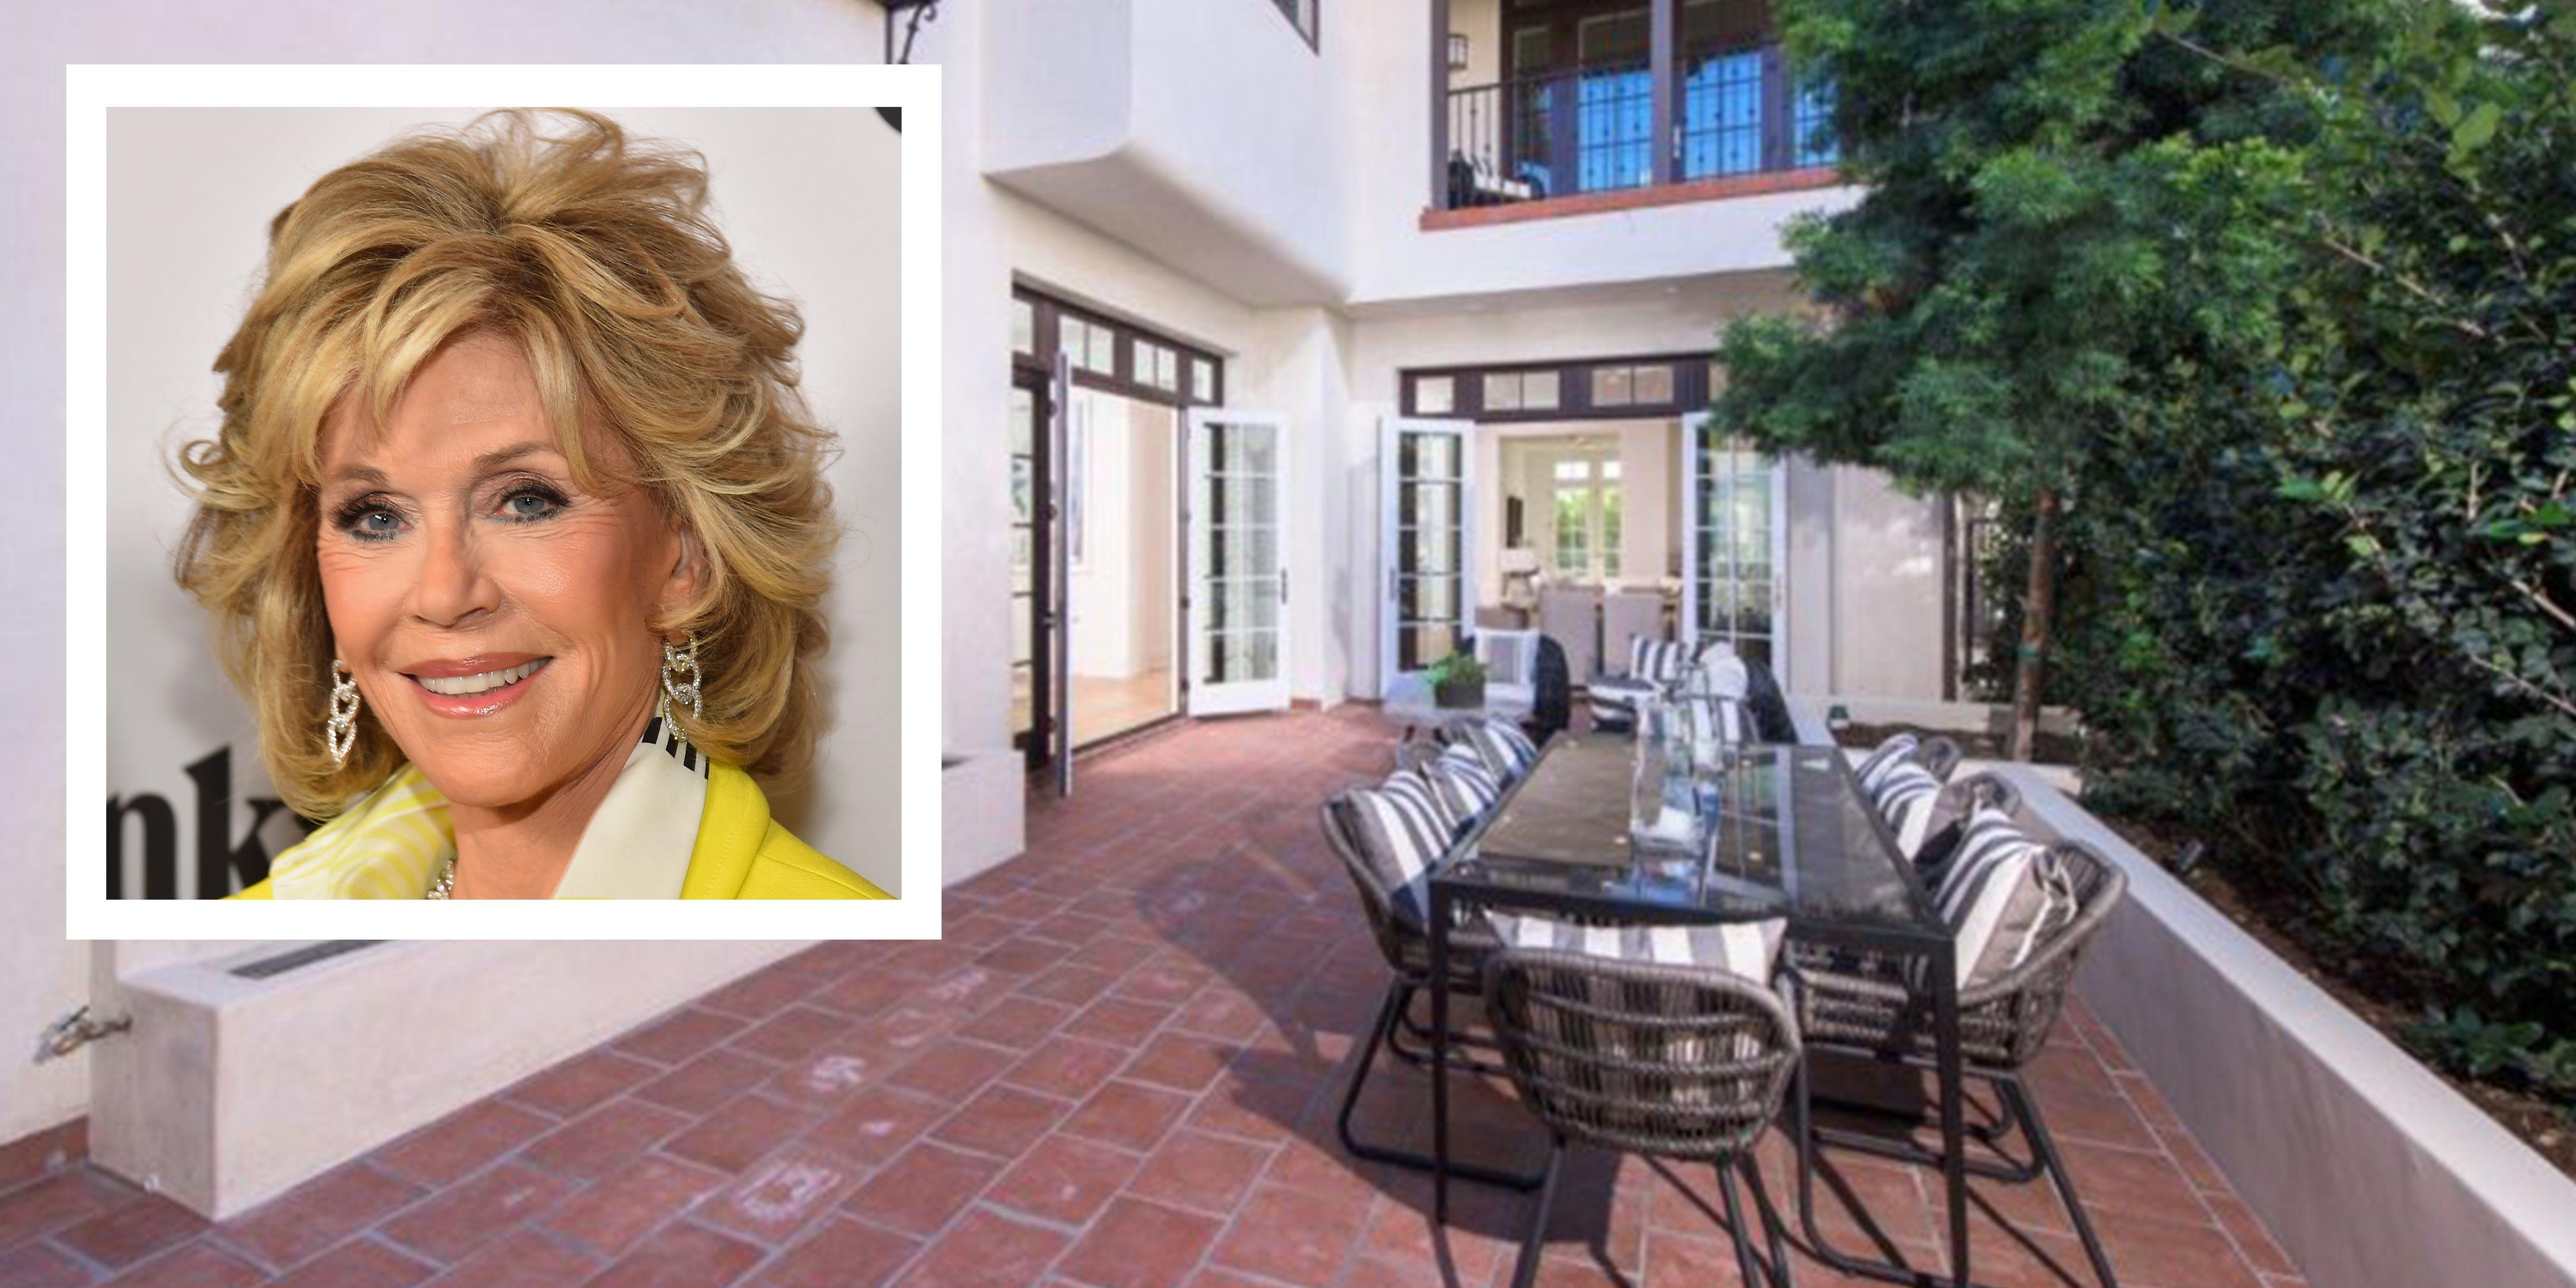 Image result for Jane Fonda sunbath